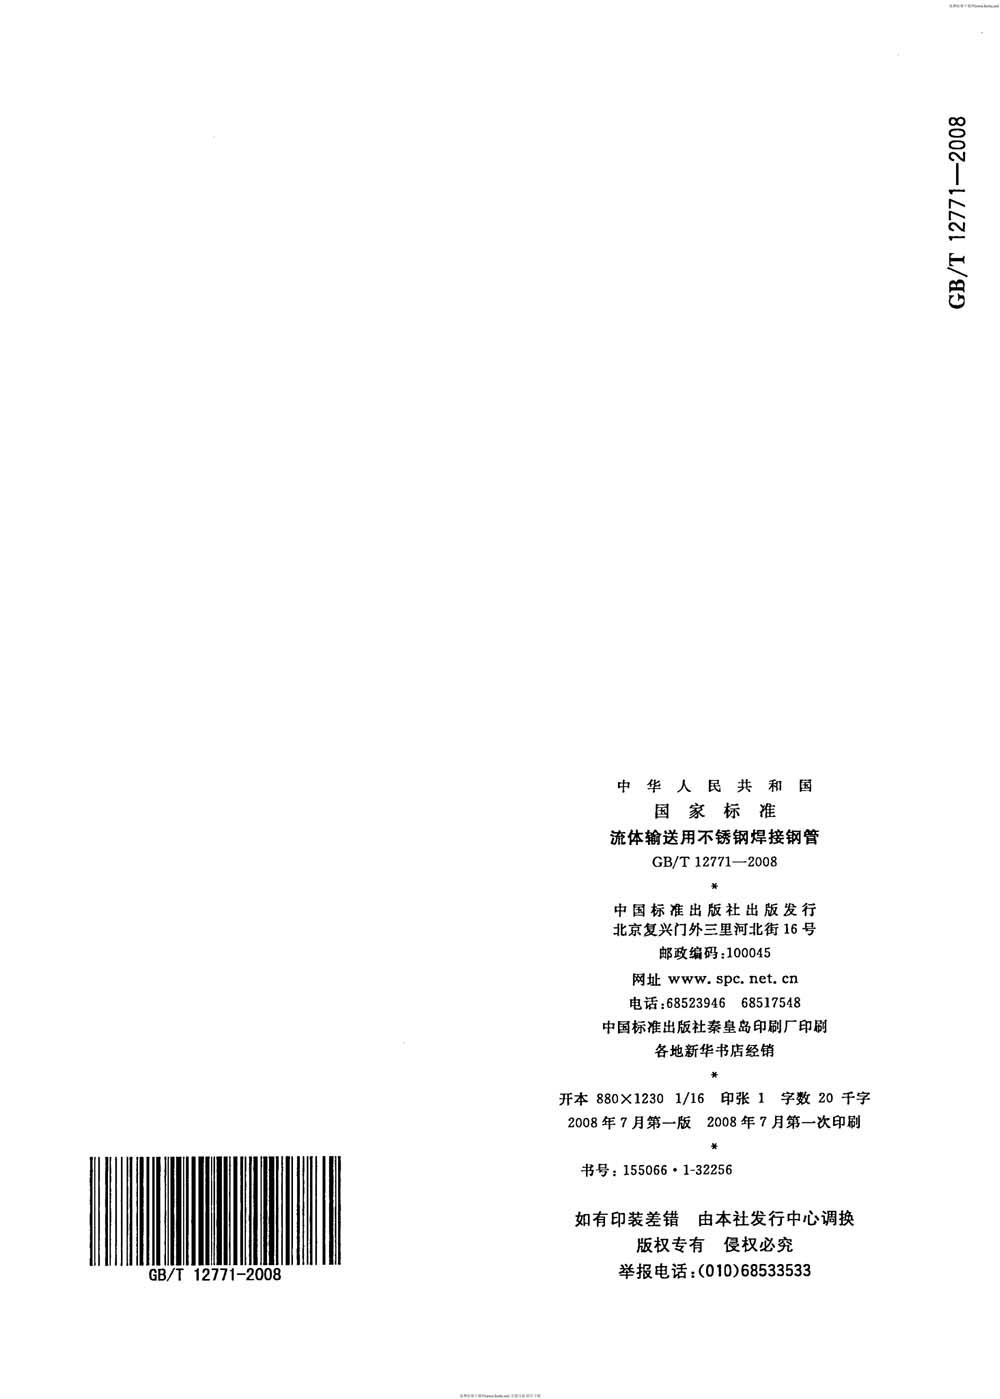 GBT 12771-2008 流體輸送用不銹鋼焊接鋼管-12 x.jpg